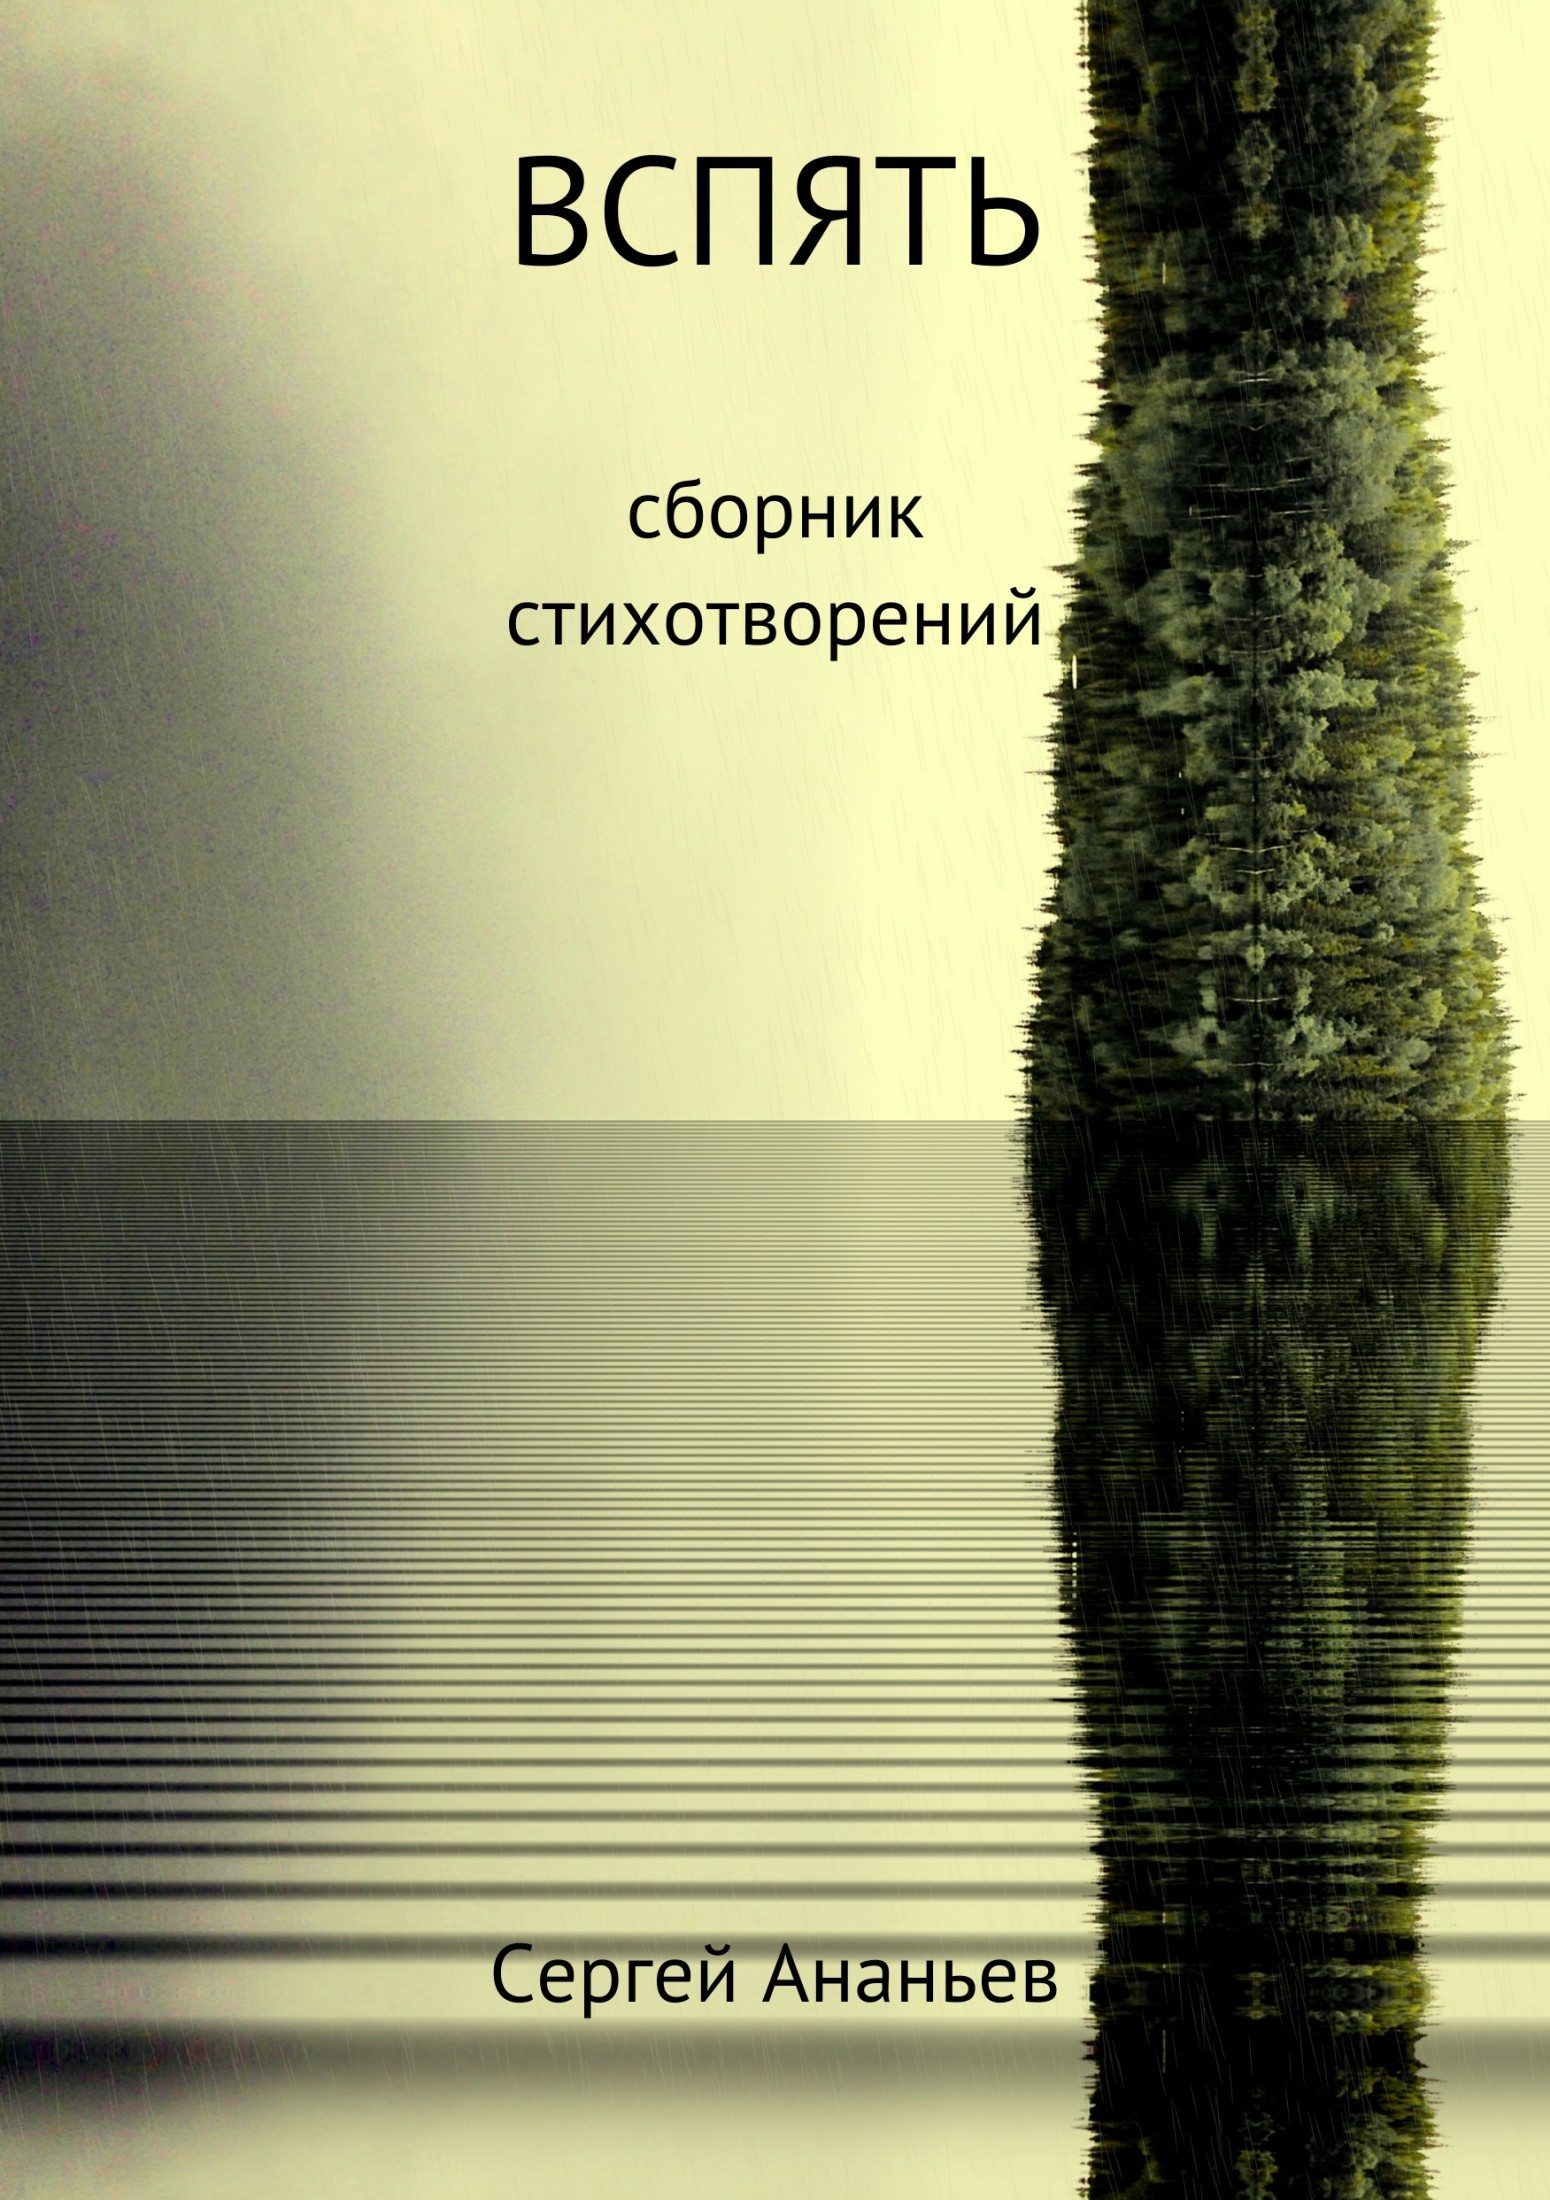 Сергей Ананьев - Вспять. Сборник стихотворений